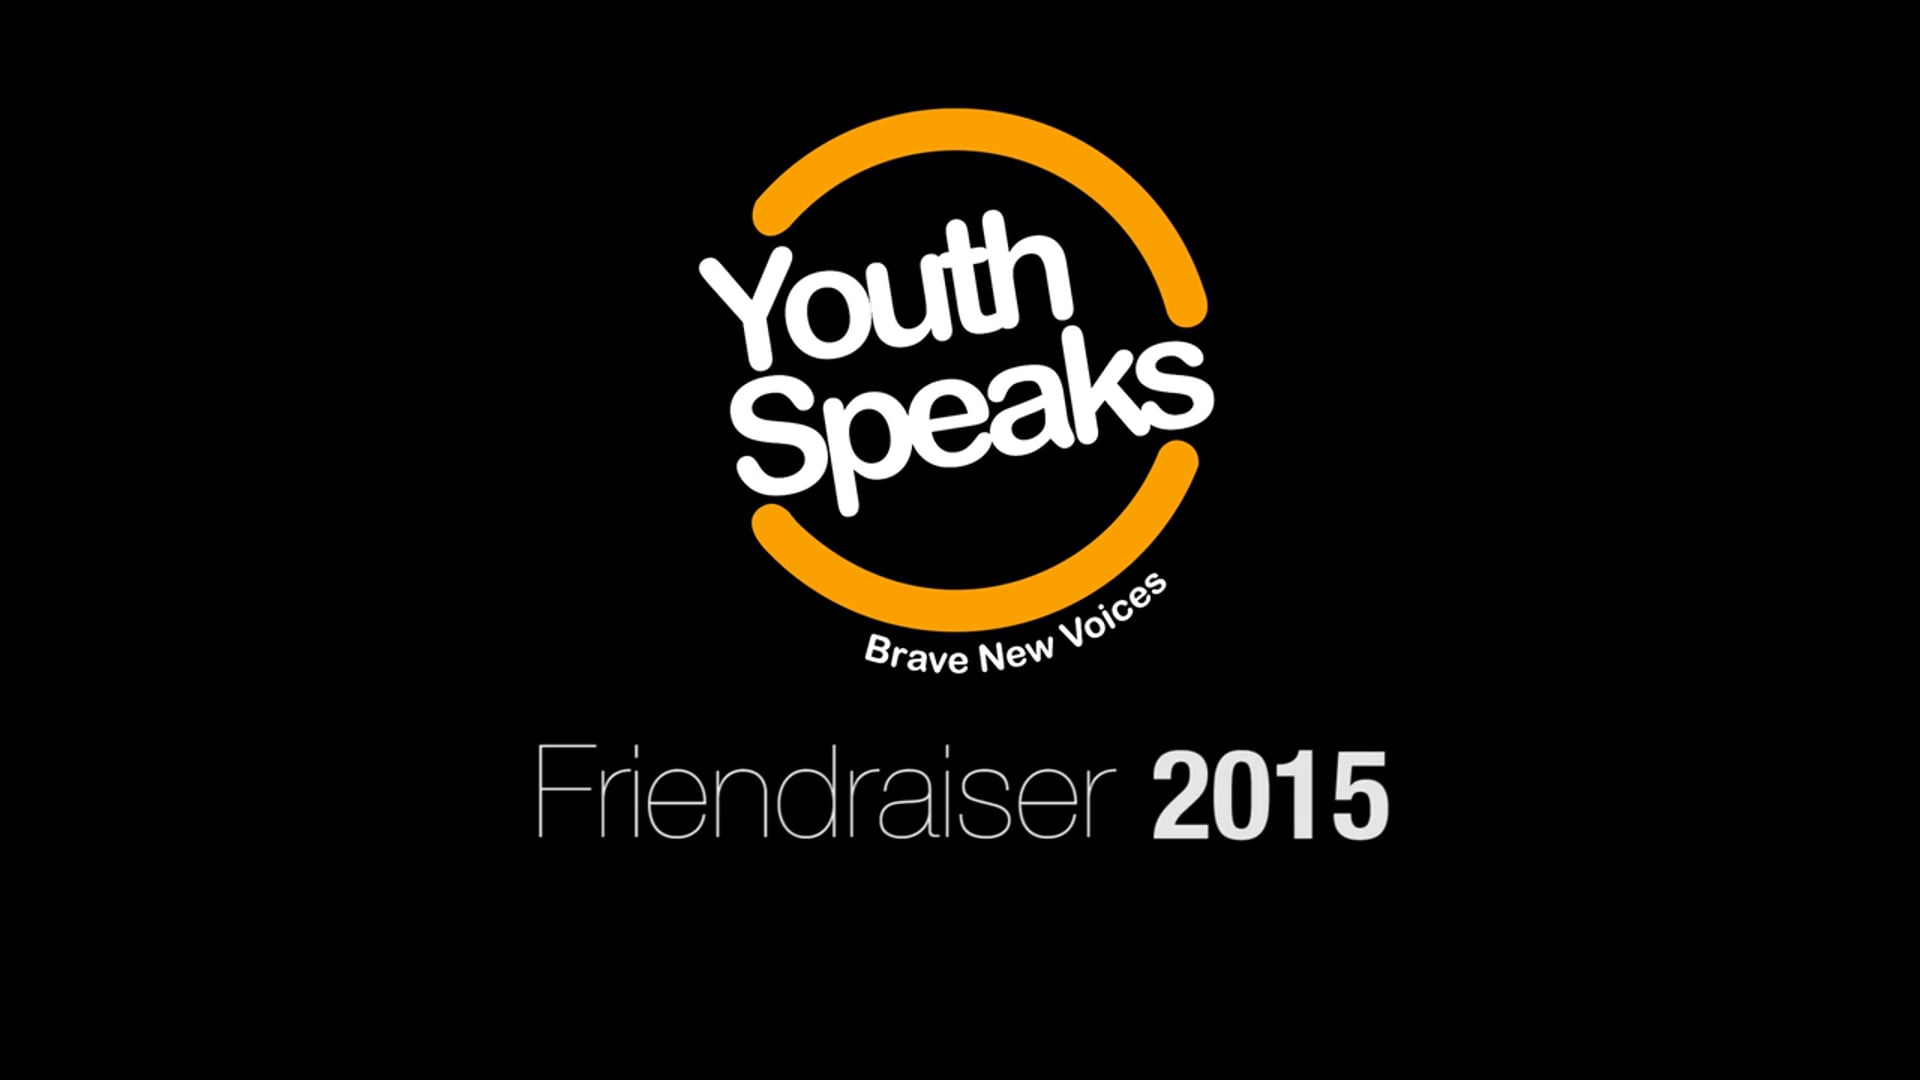 Youth Speaks Friendraiser 2015 Event